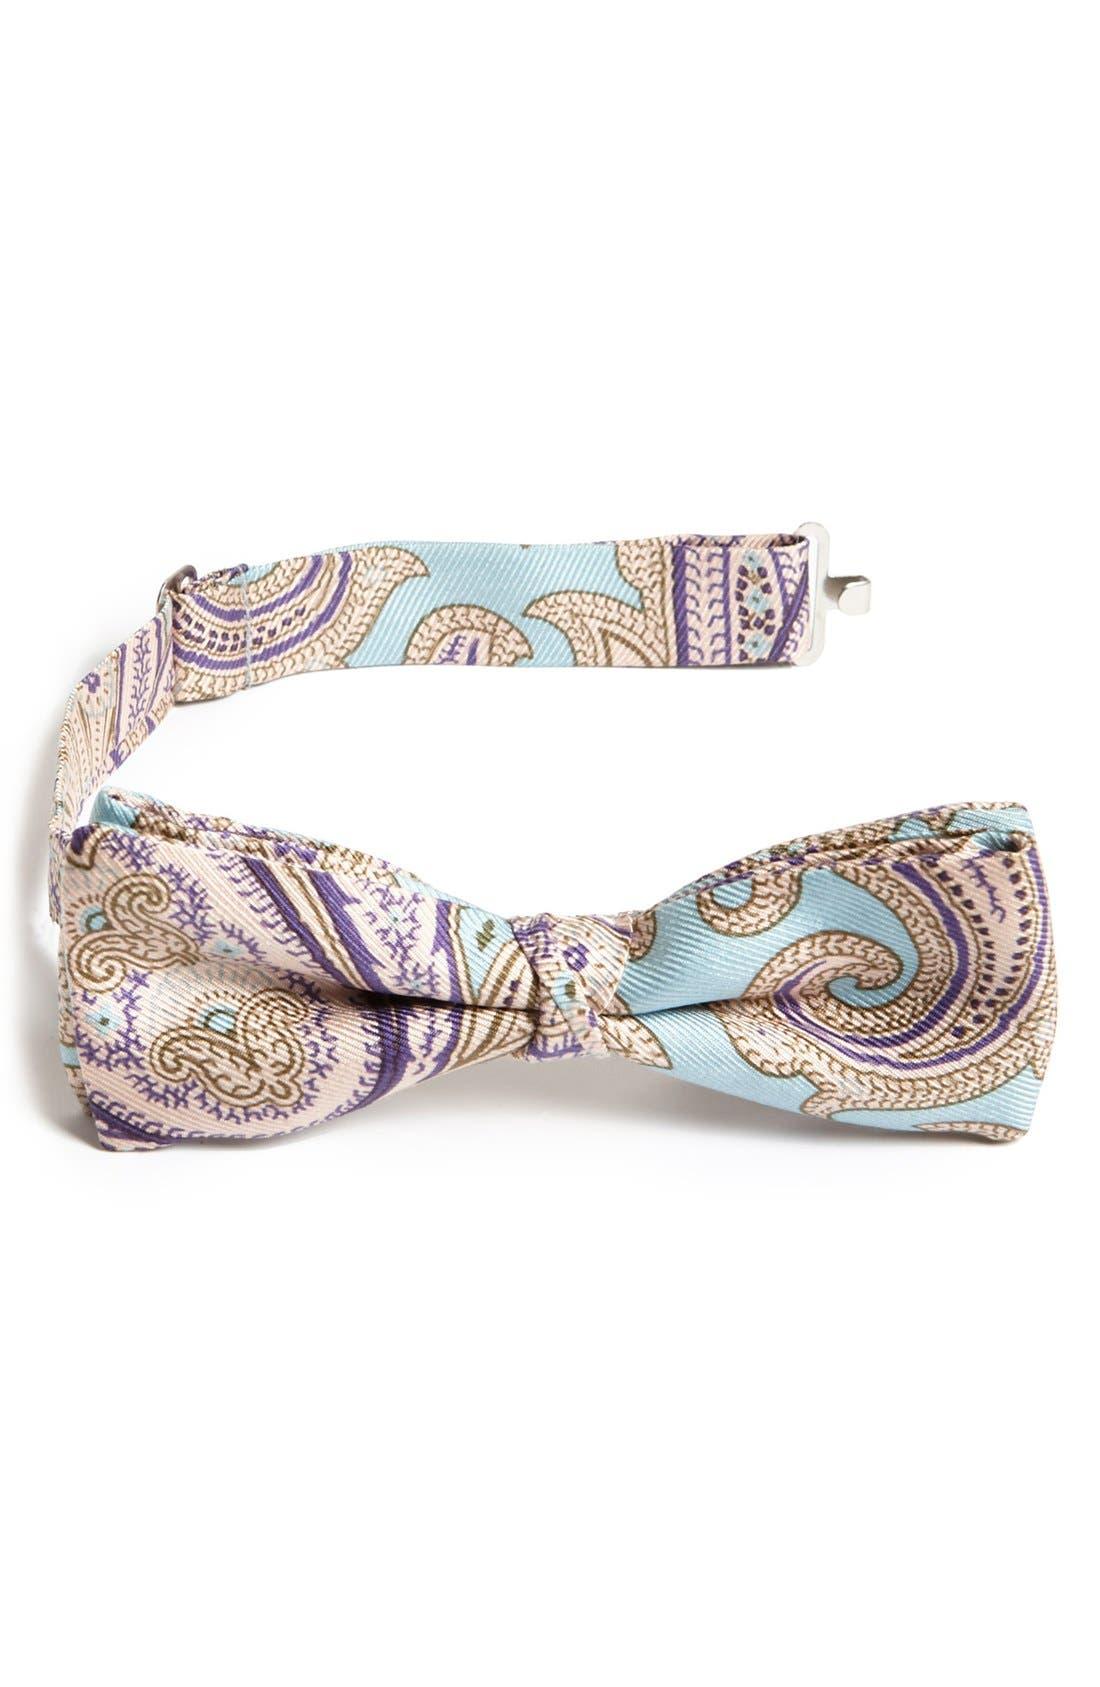 Alternate Image 1 Selected - Etro Paisley Silk Bow Tie